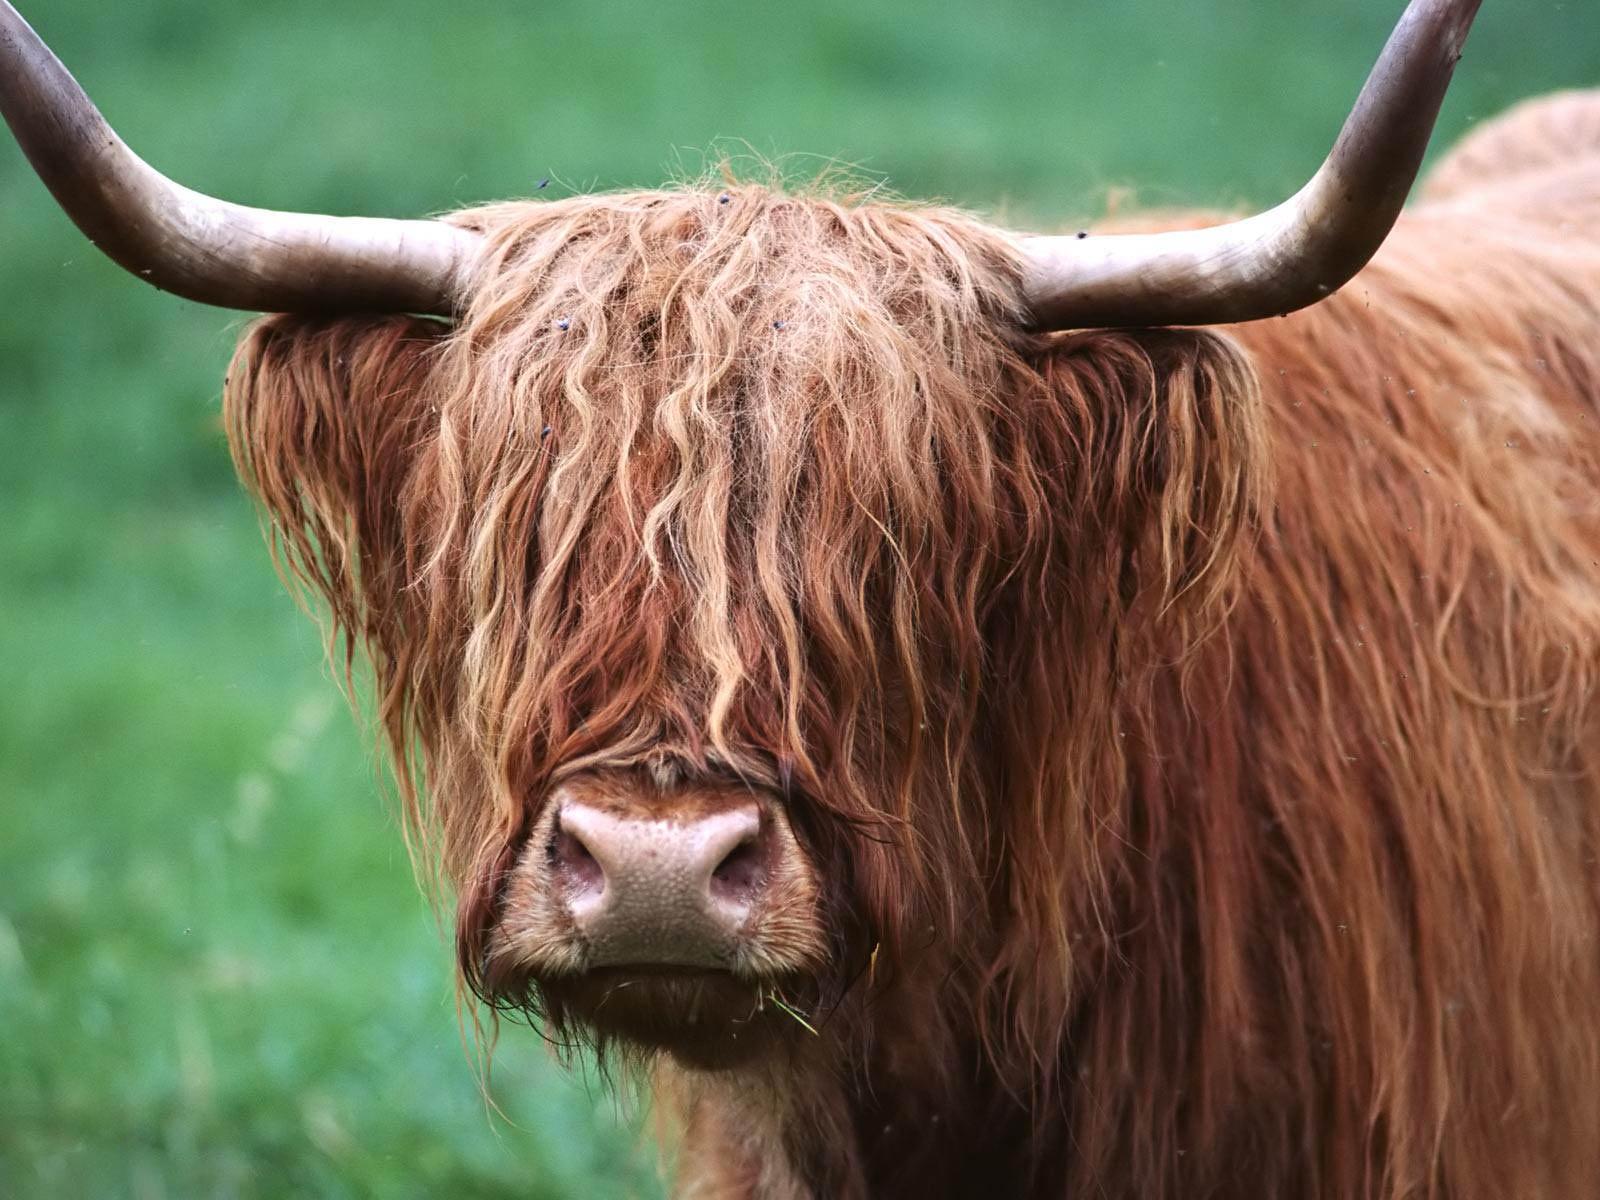 Wonderful Bison Wallpaper - bison-wallpaper-3  Trends_1007844.jpg